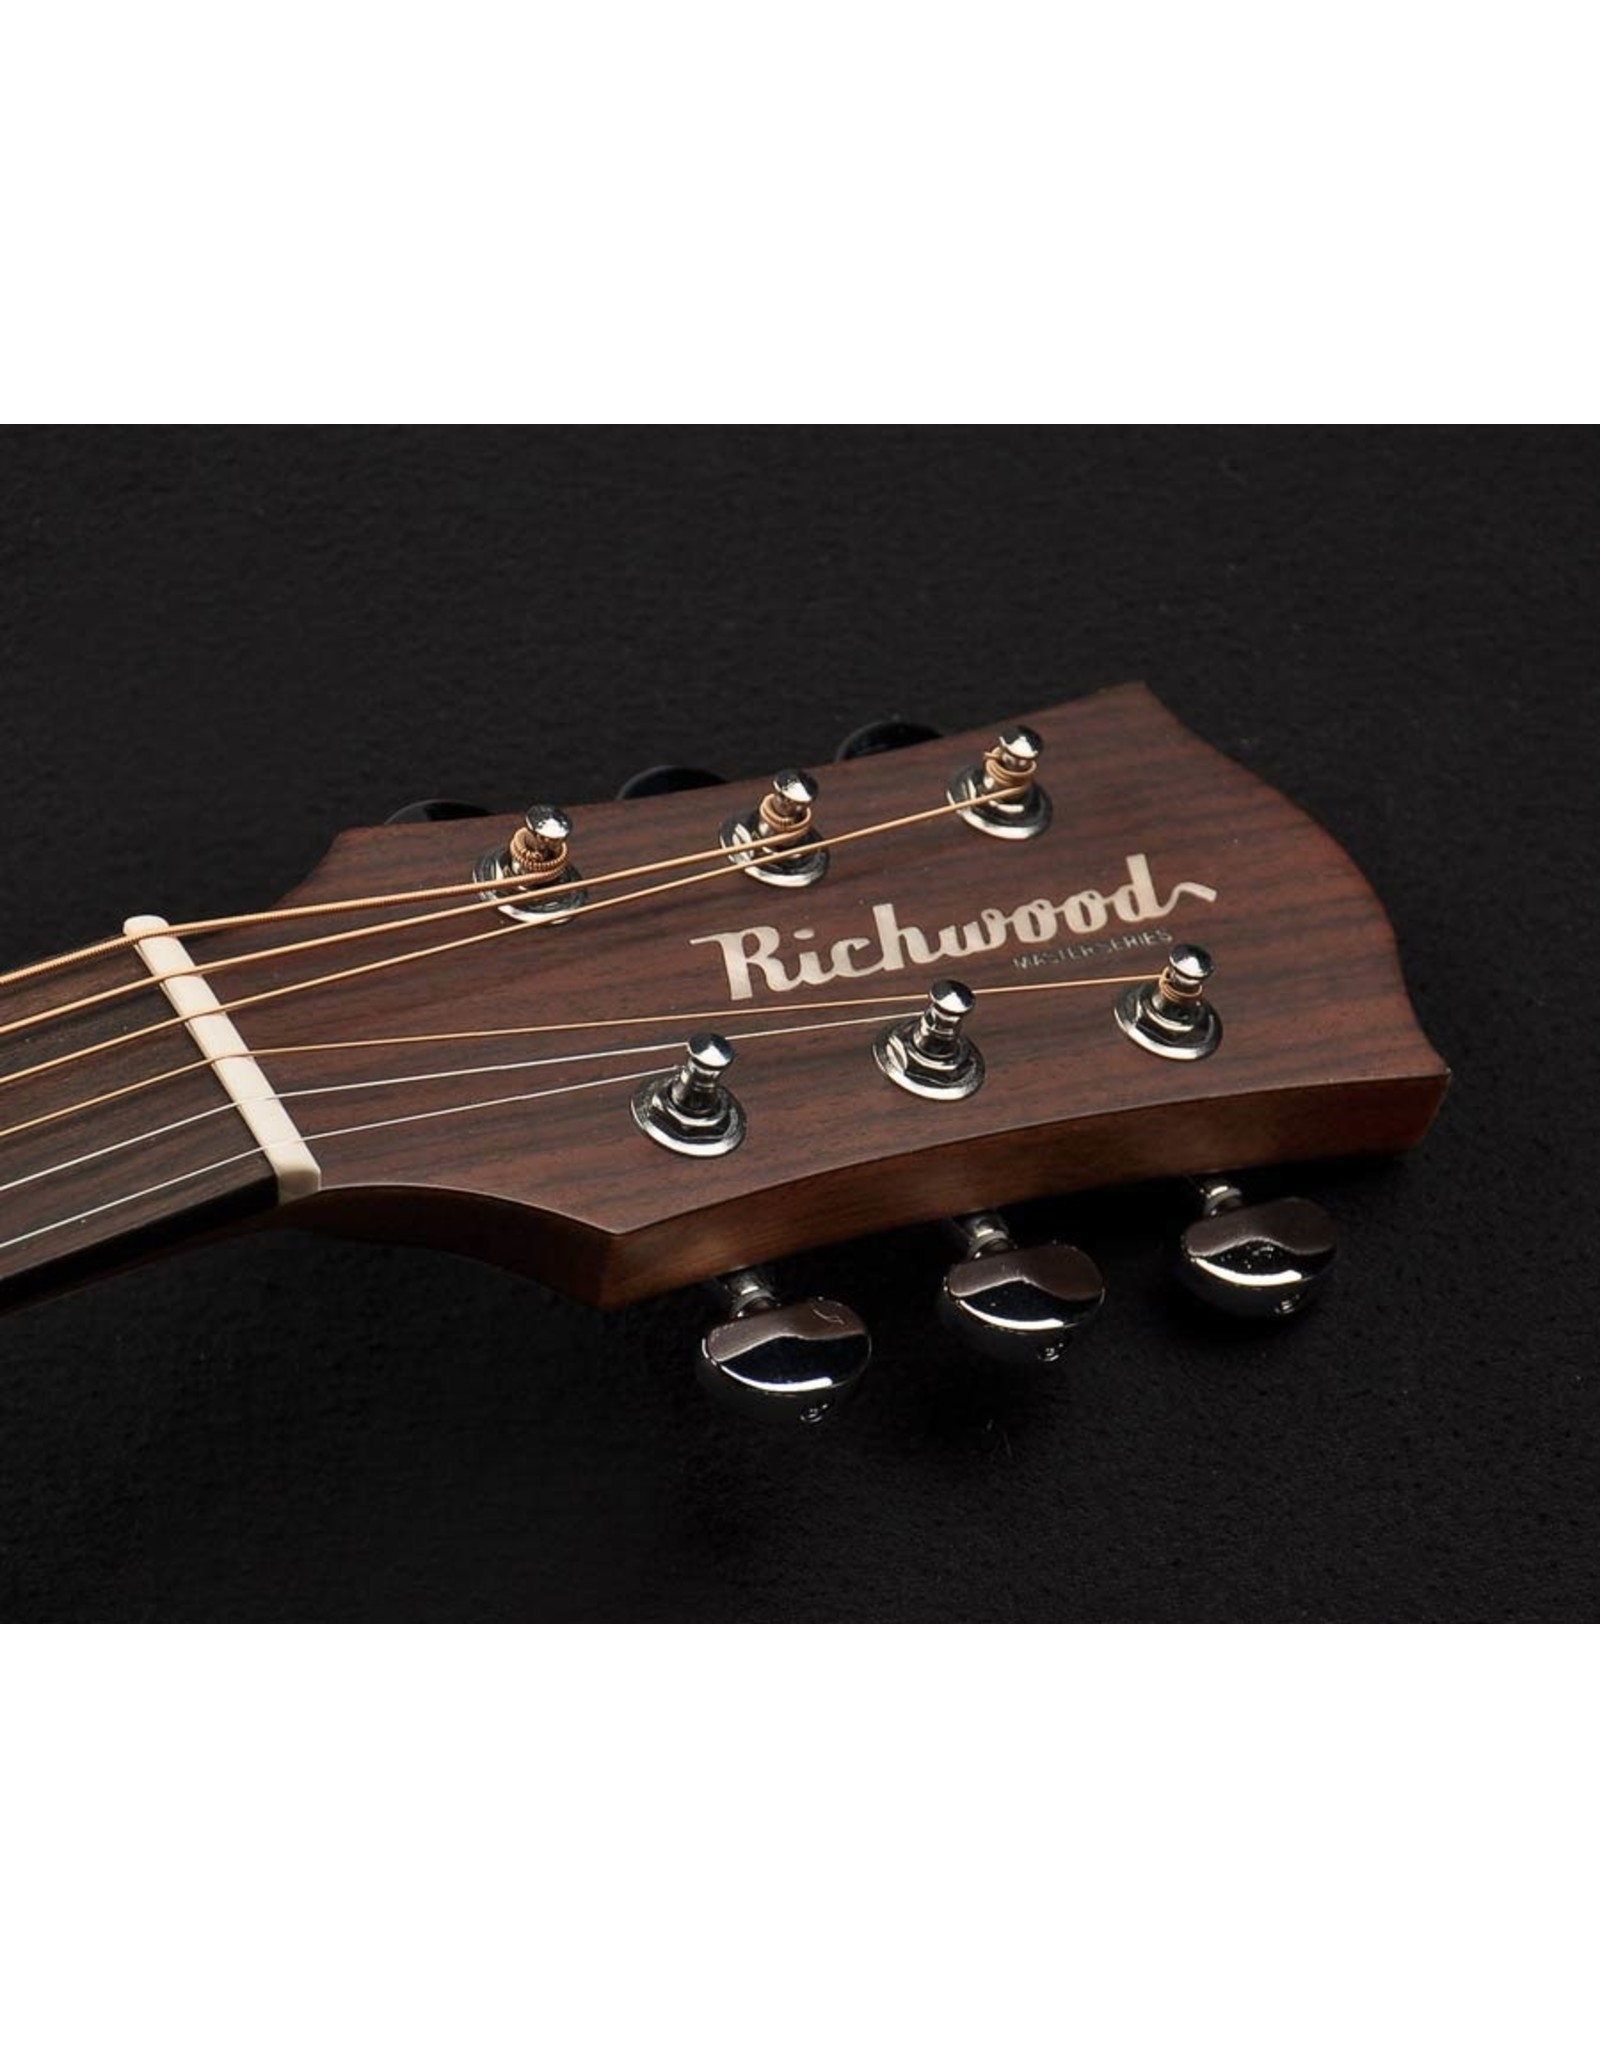 Richwood Richwood D-20-CE Dreadnought